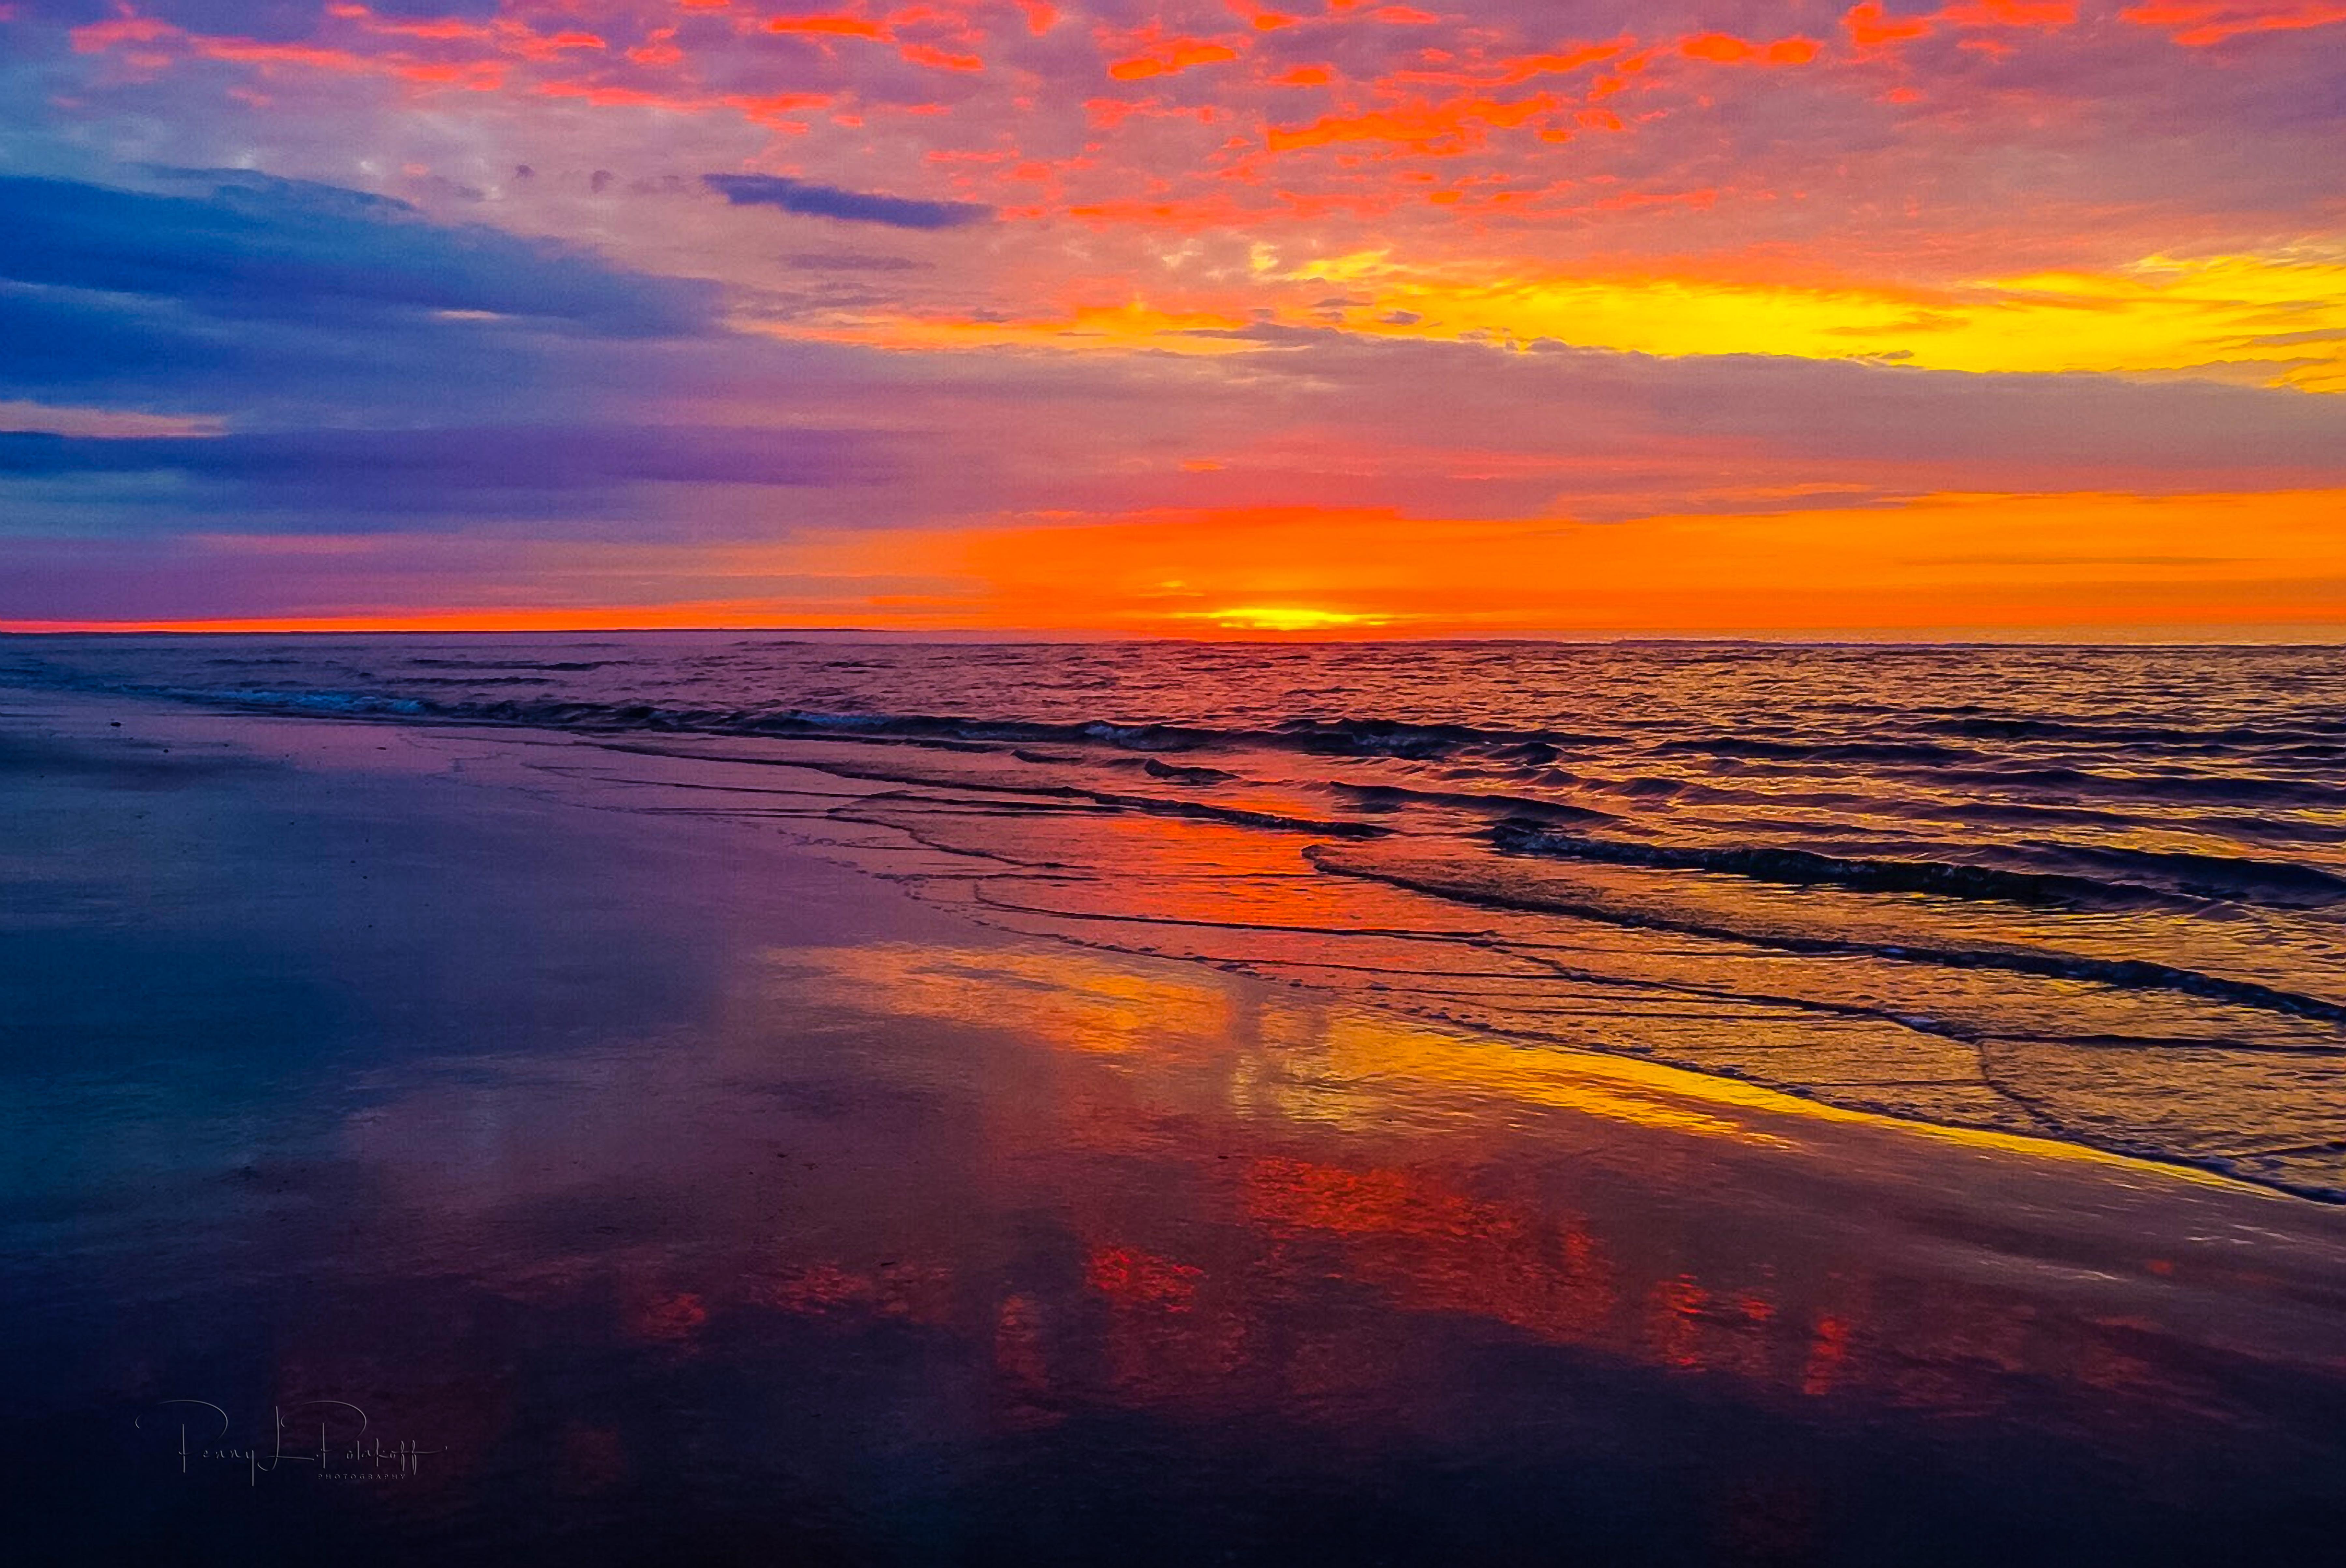 Ogunquit-Sunrise-with-PLP-Watermark-Best